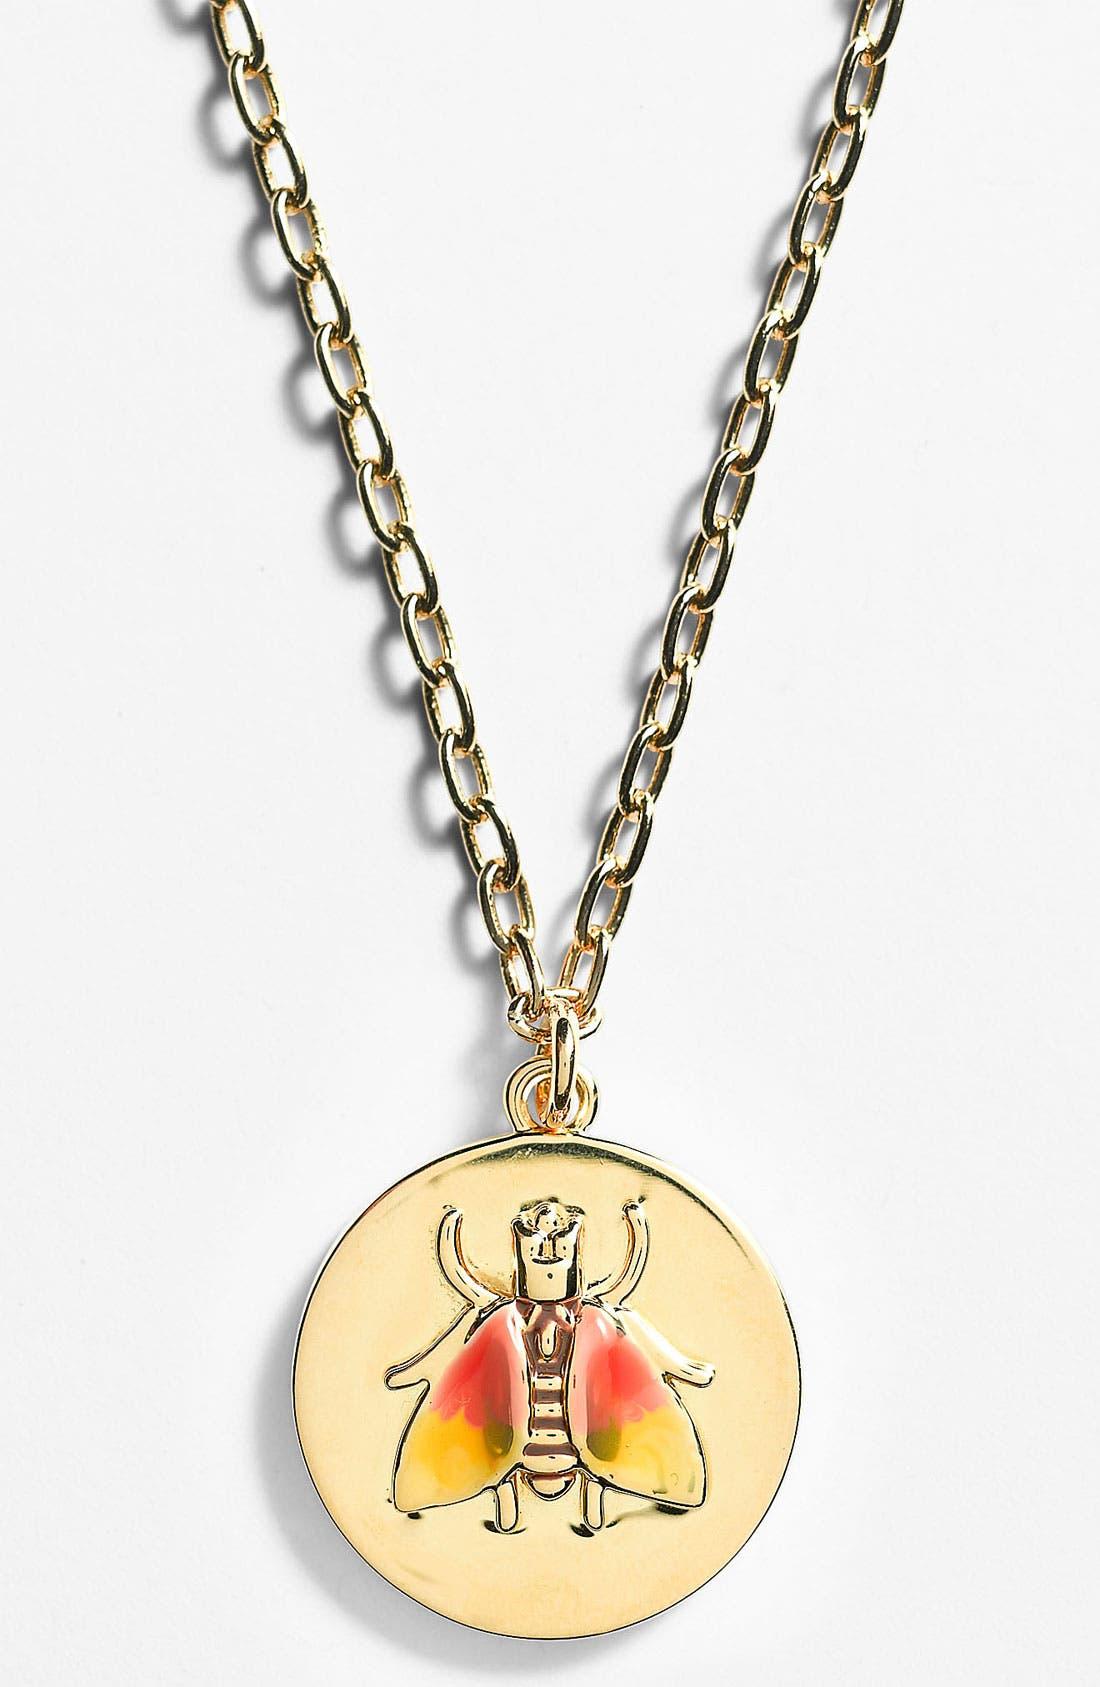 Main Image - Tory Burch 'Buddy' Pendant Necklace